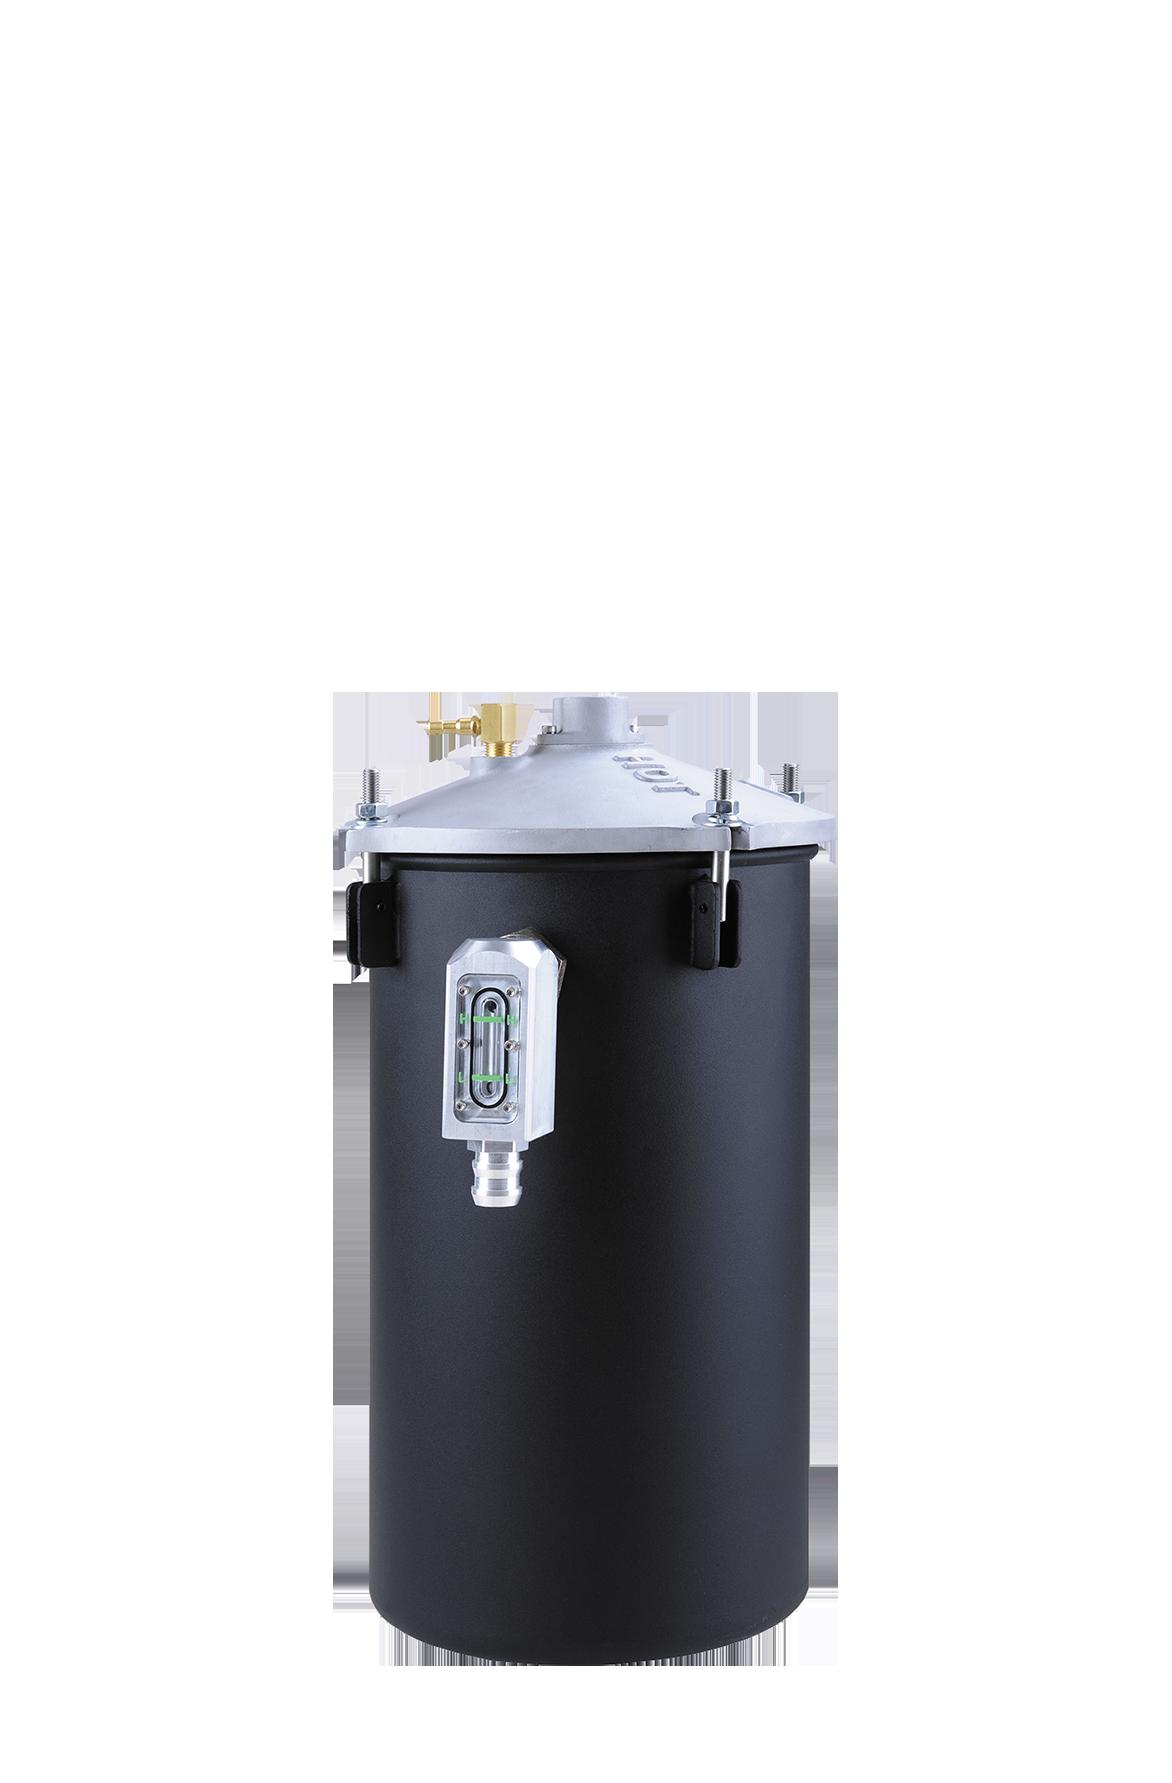 Fuel Filter & Oil Filter Technology Solving Biodiesel (B20) & Engine Oil 3